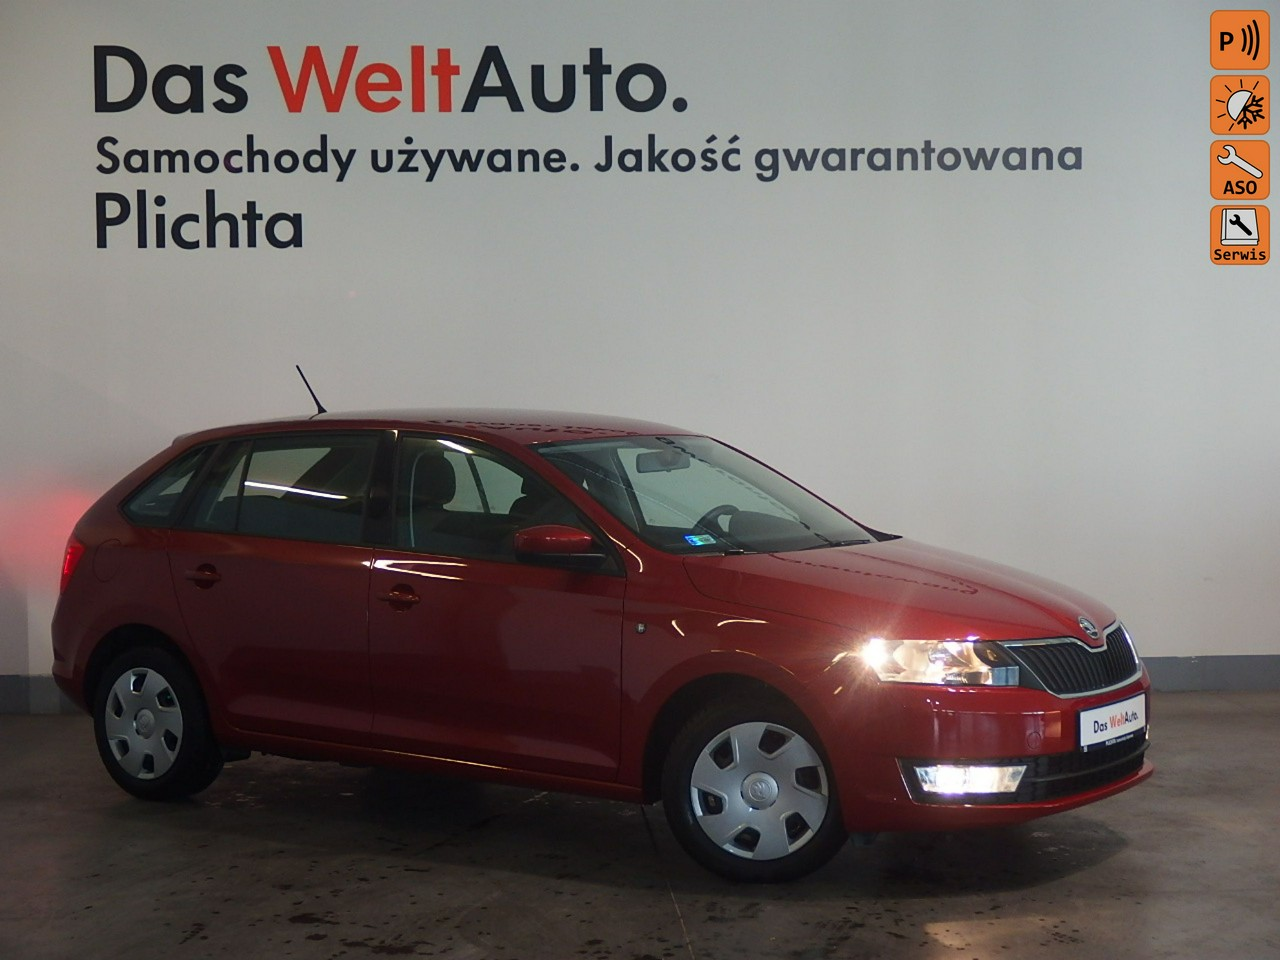 1.2 TSI 105KM Gwarancja Dealer Plichta VW